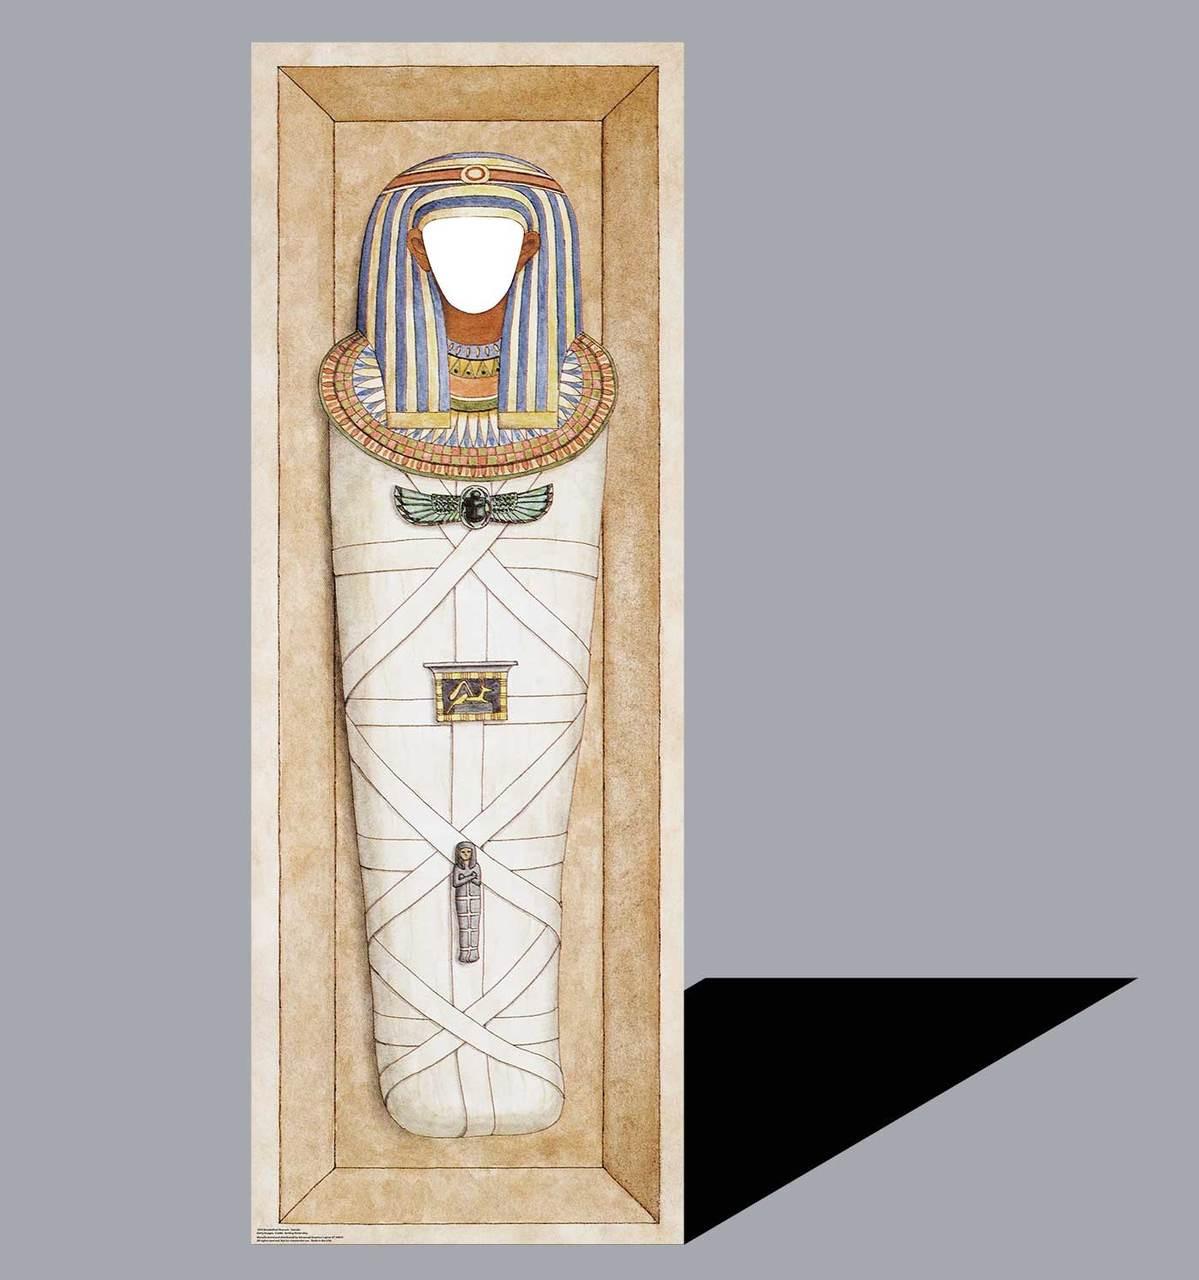 Life-size Mummified Pharaoh Standin Cardboard Standup